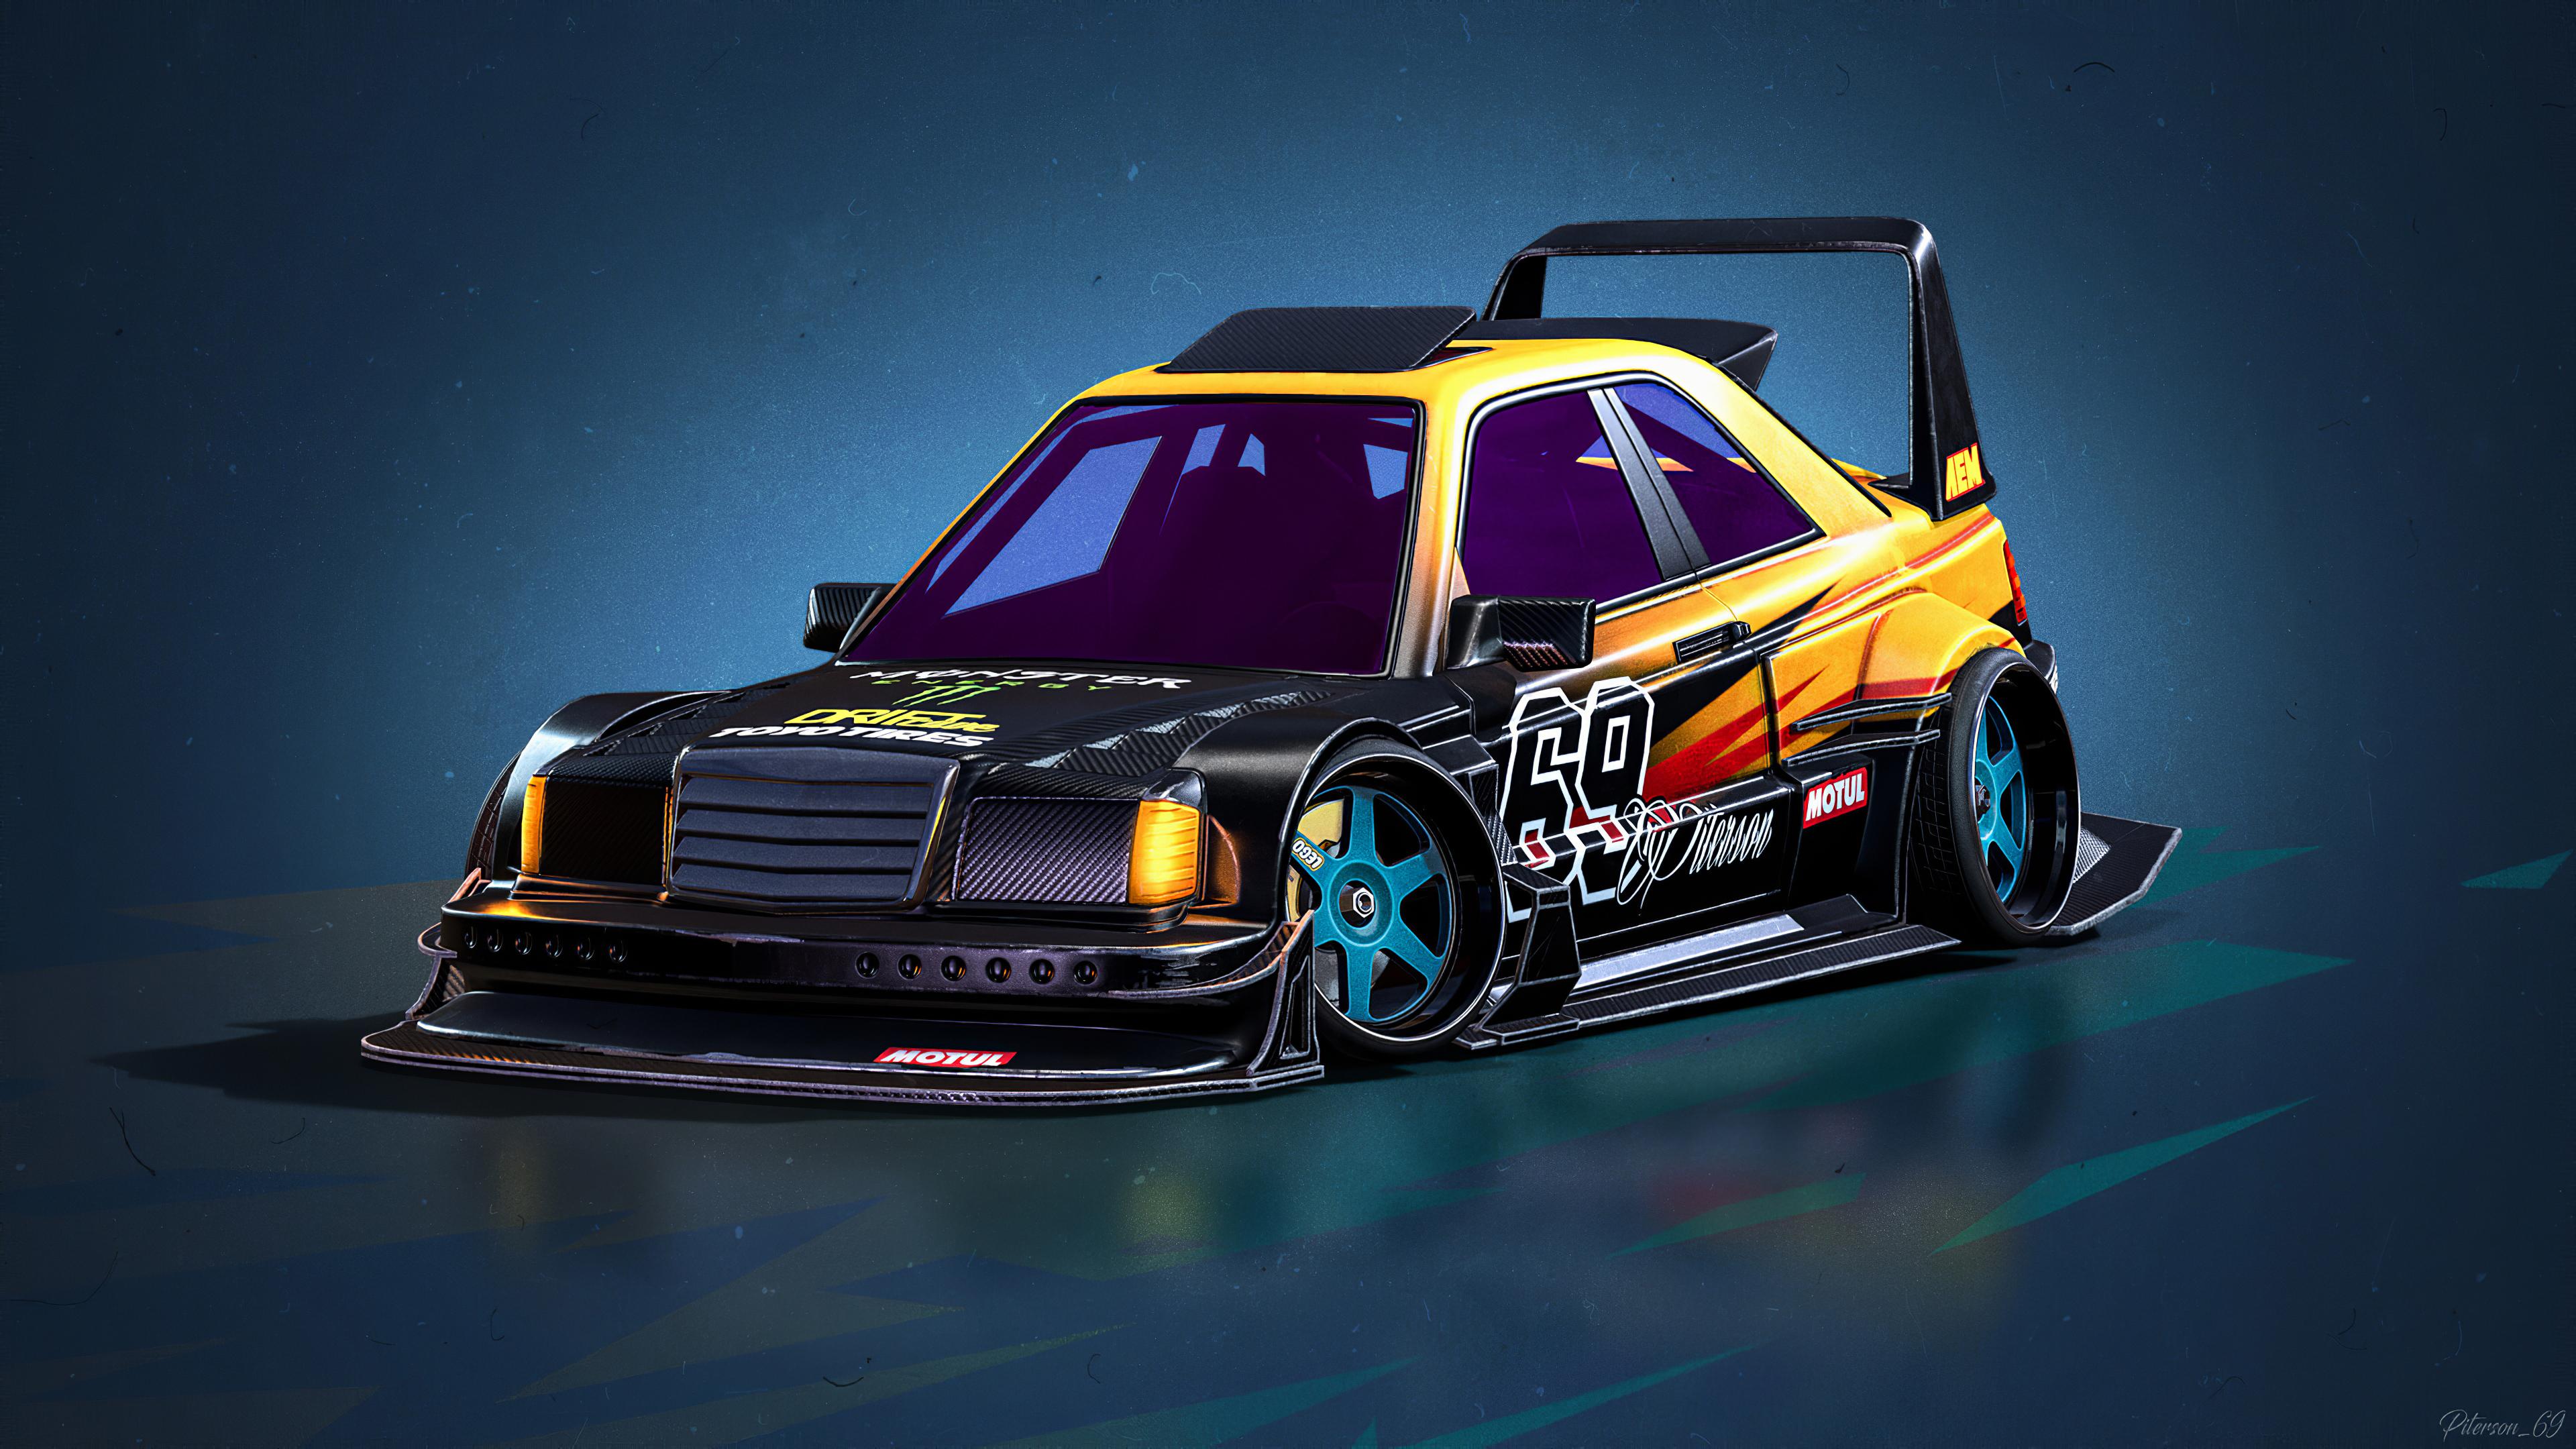 mercedes benz e190 evolution ii 1990 cartoon cars 1578255361 - Mercedes Benz E190 Evolution II 1990 Cartoon Cars -